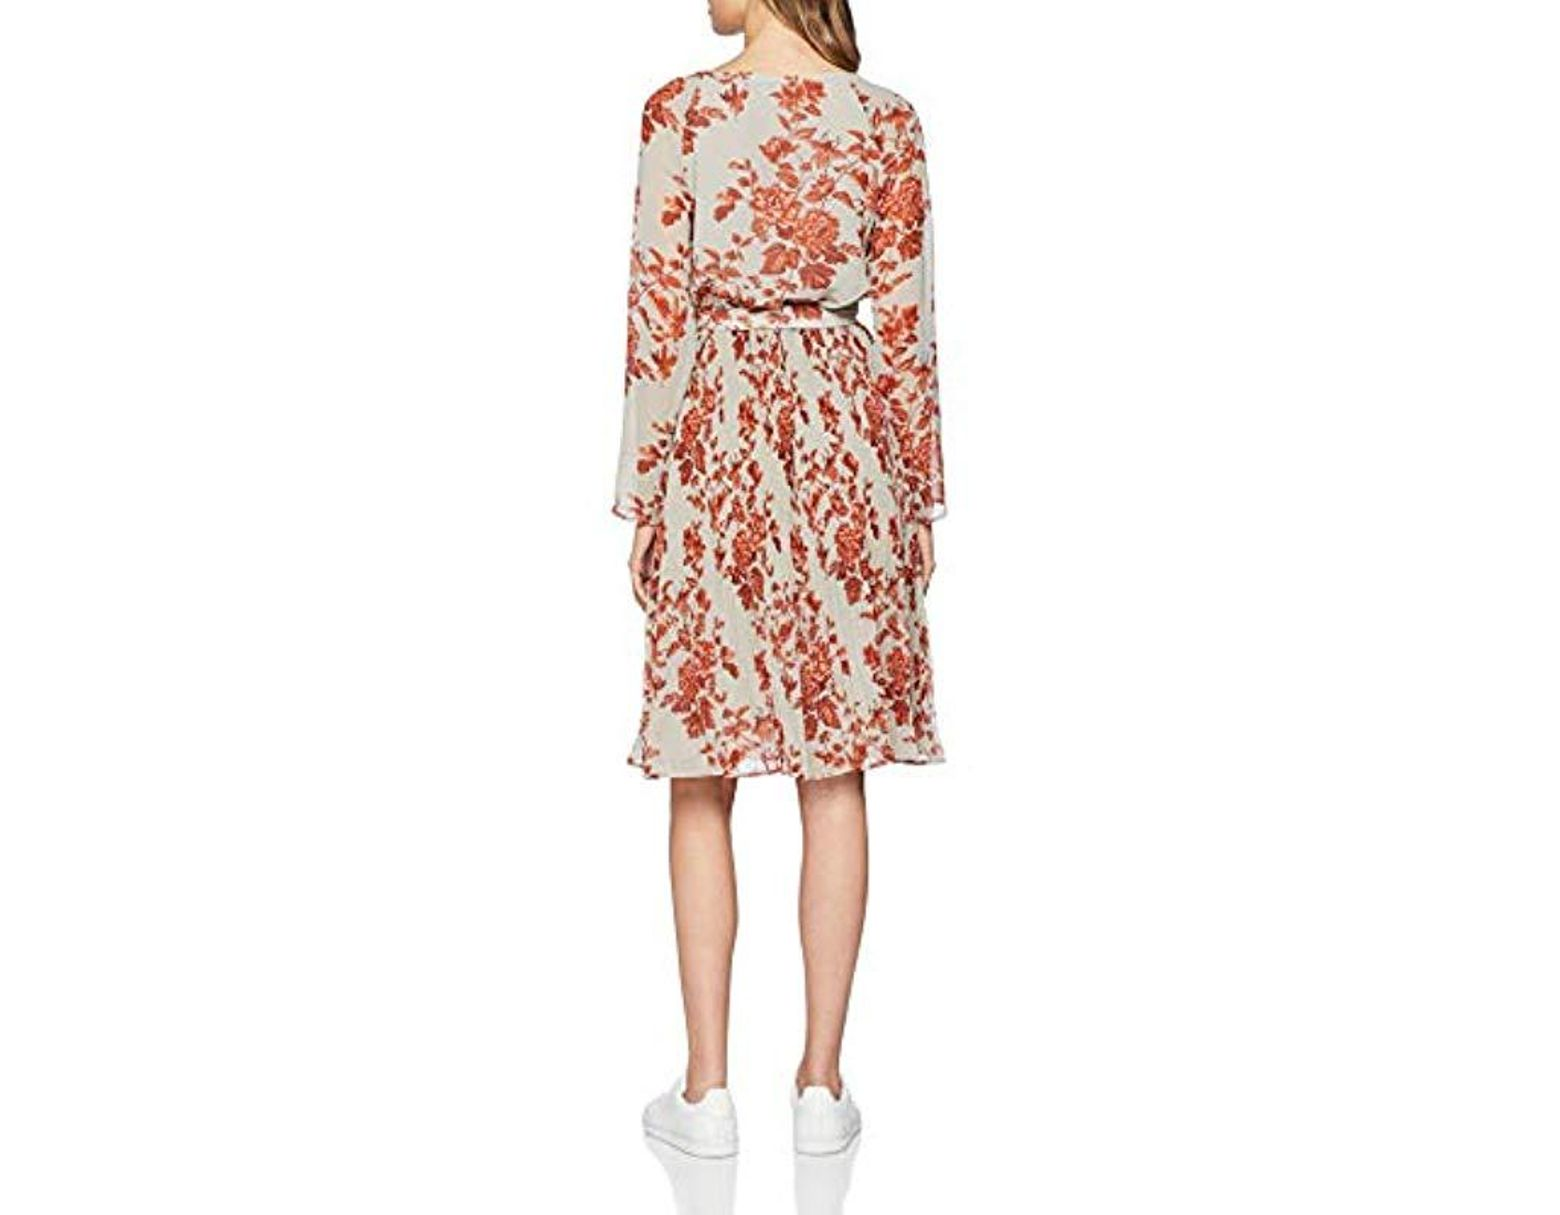 e7db67486e Pepe Jeans Natasha Floral Skirt - Lyst